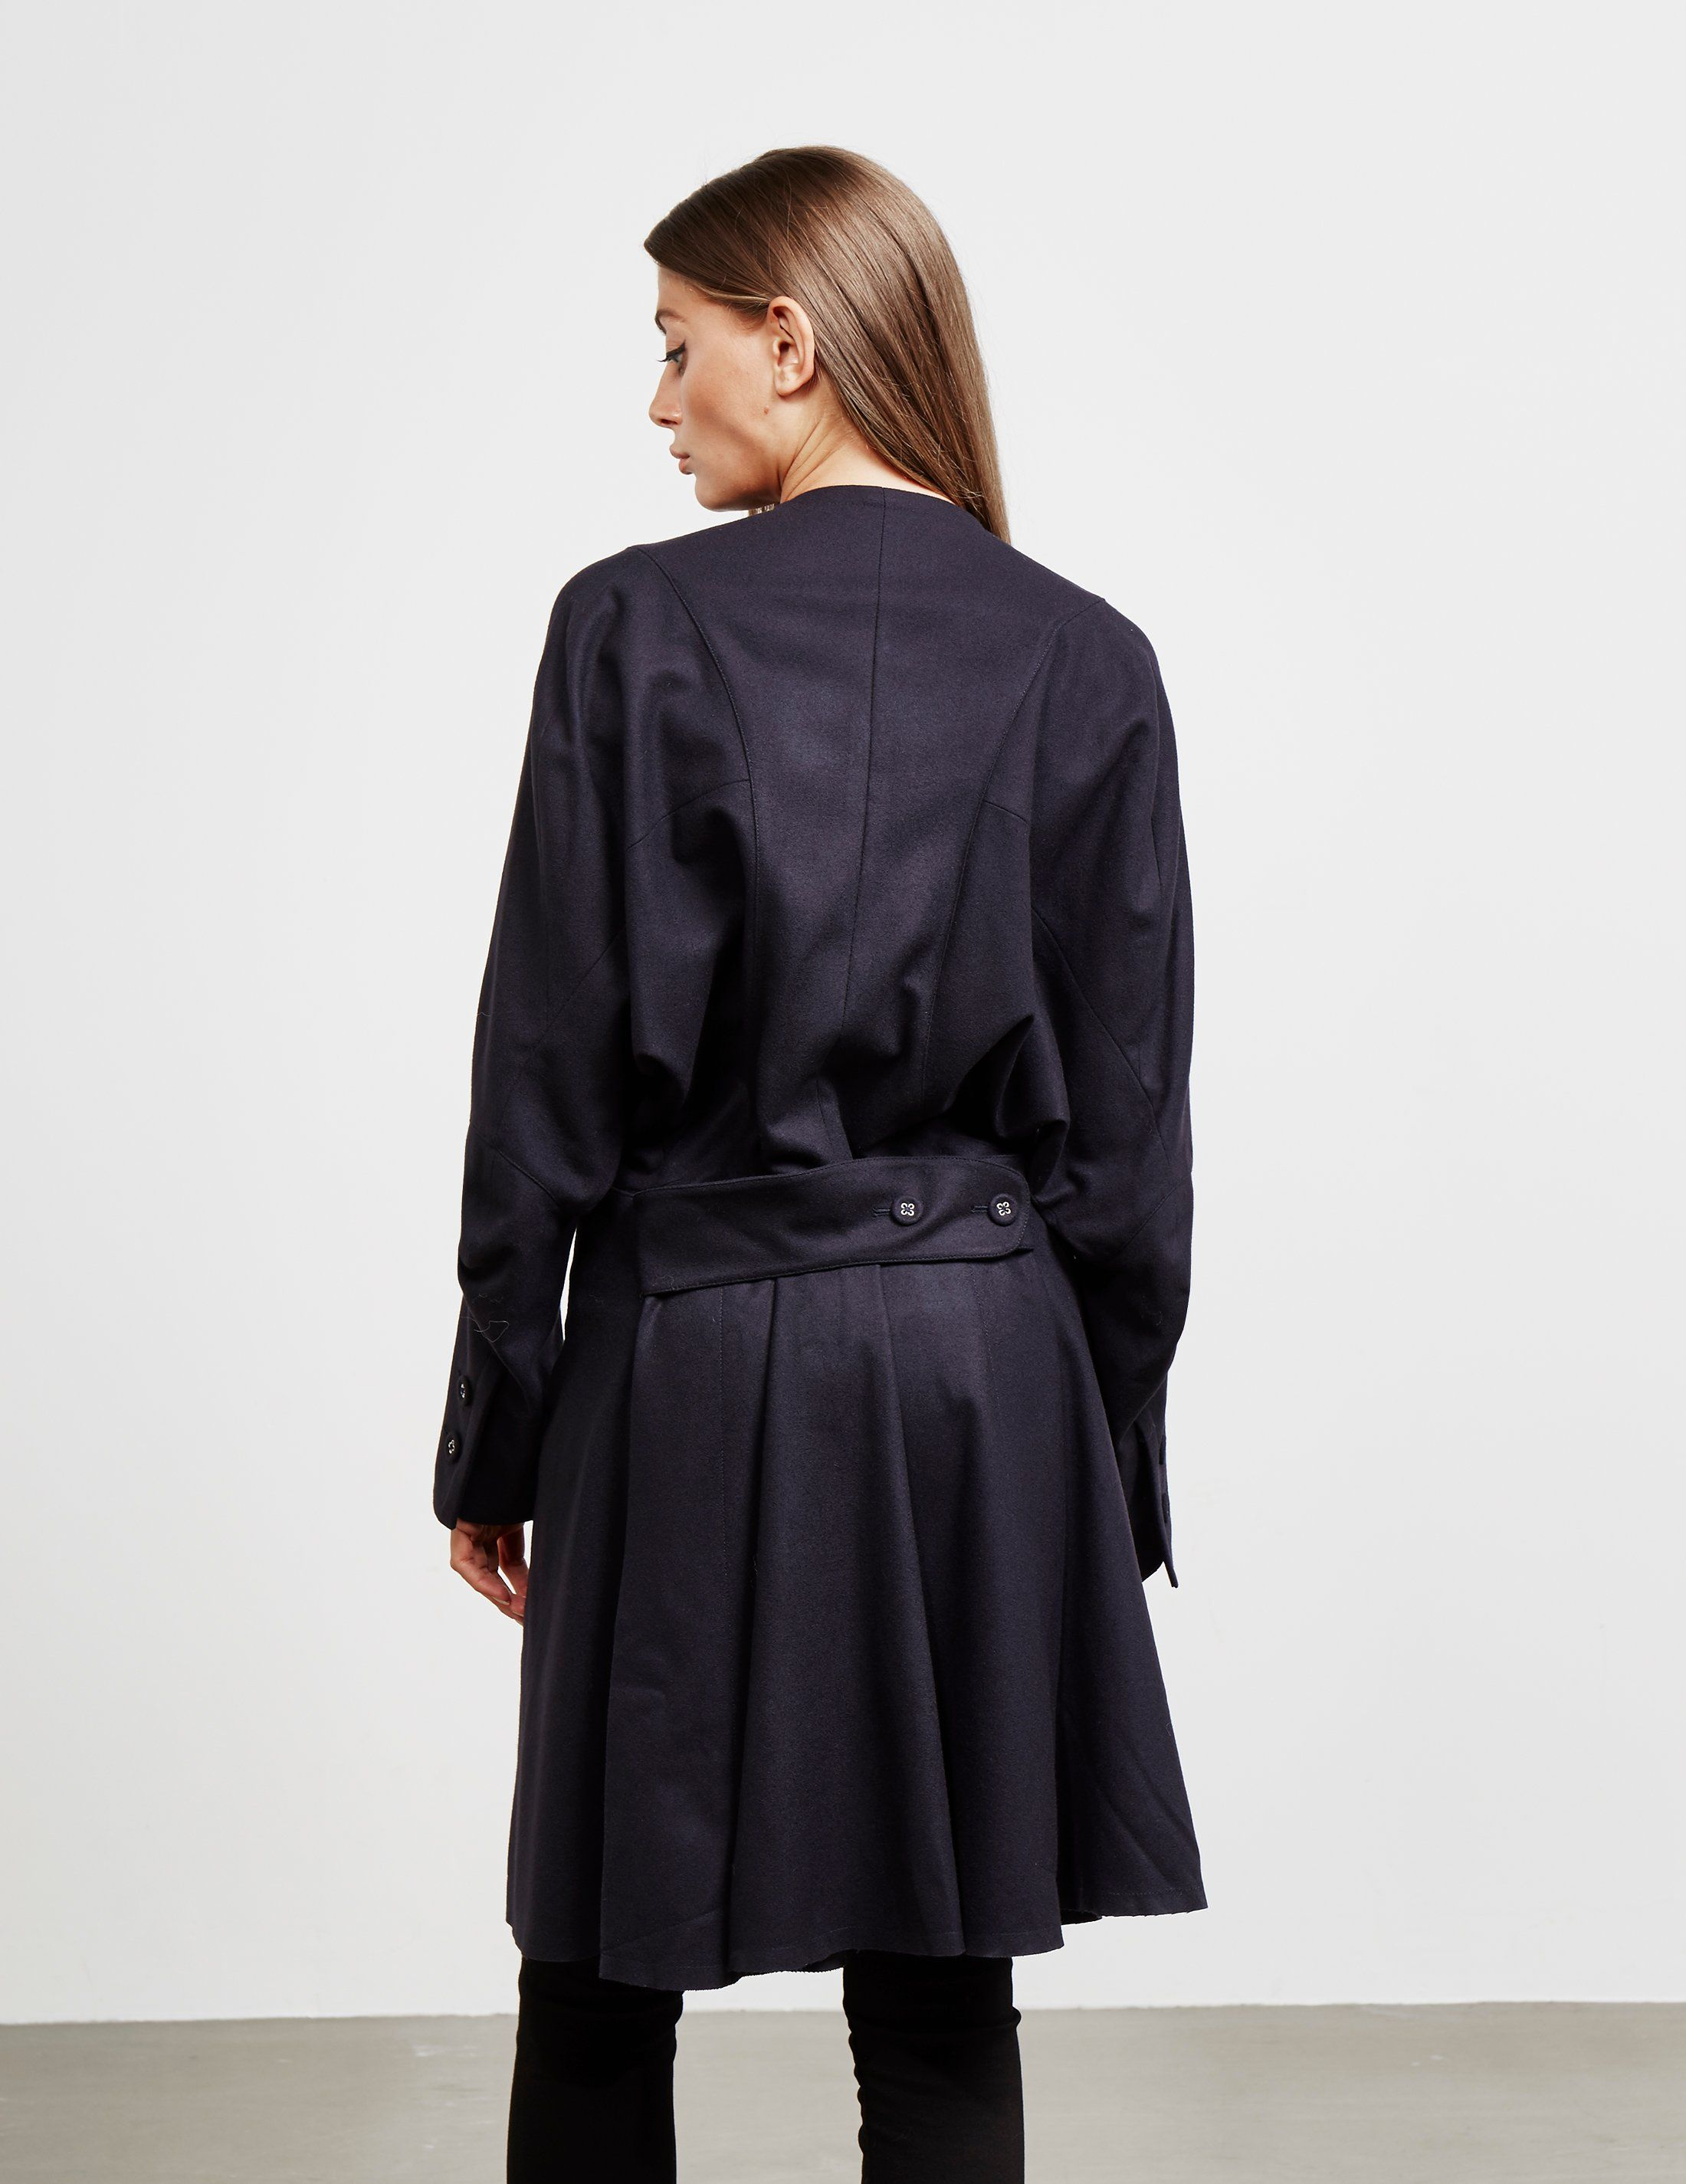 Vivienne Westwood Anglomania Pier Coat - Online Exclusive